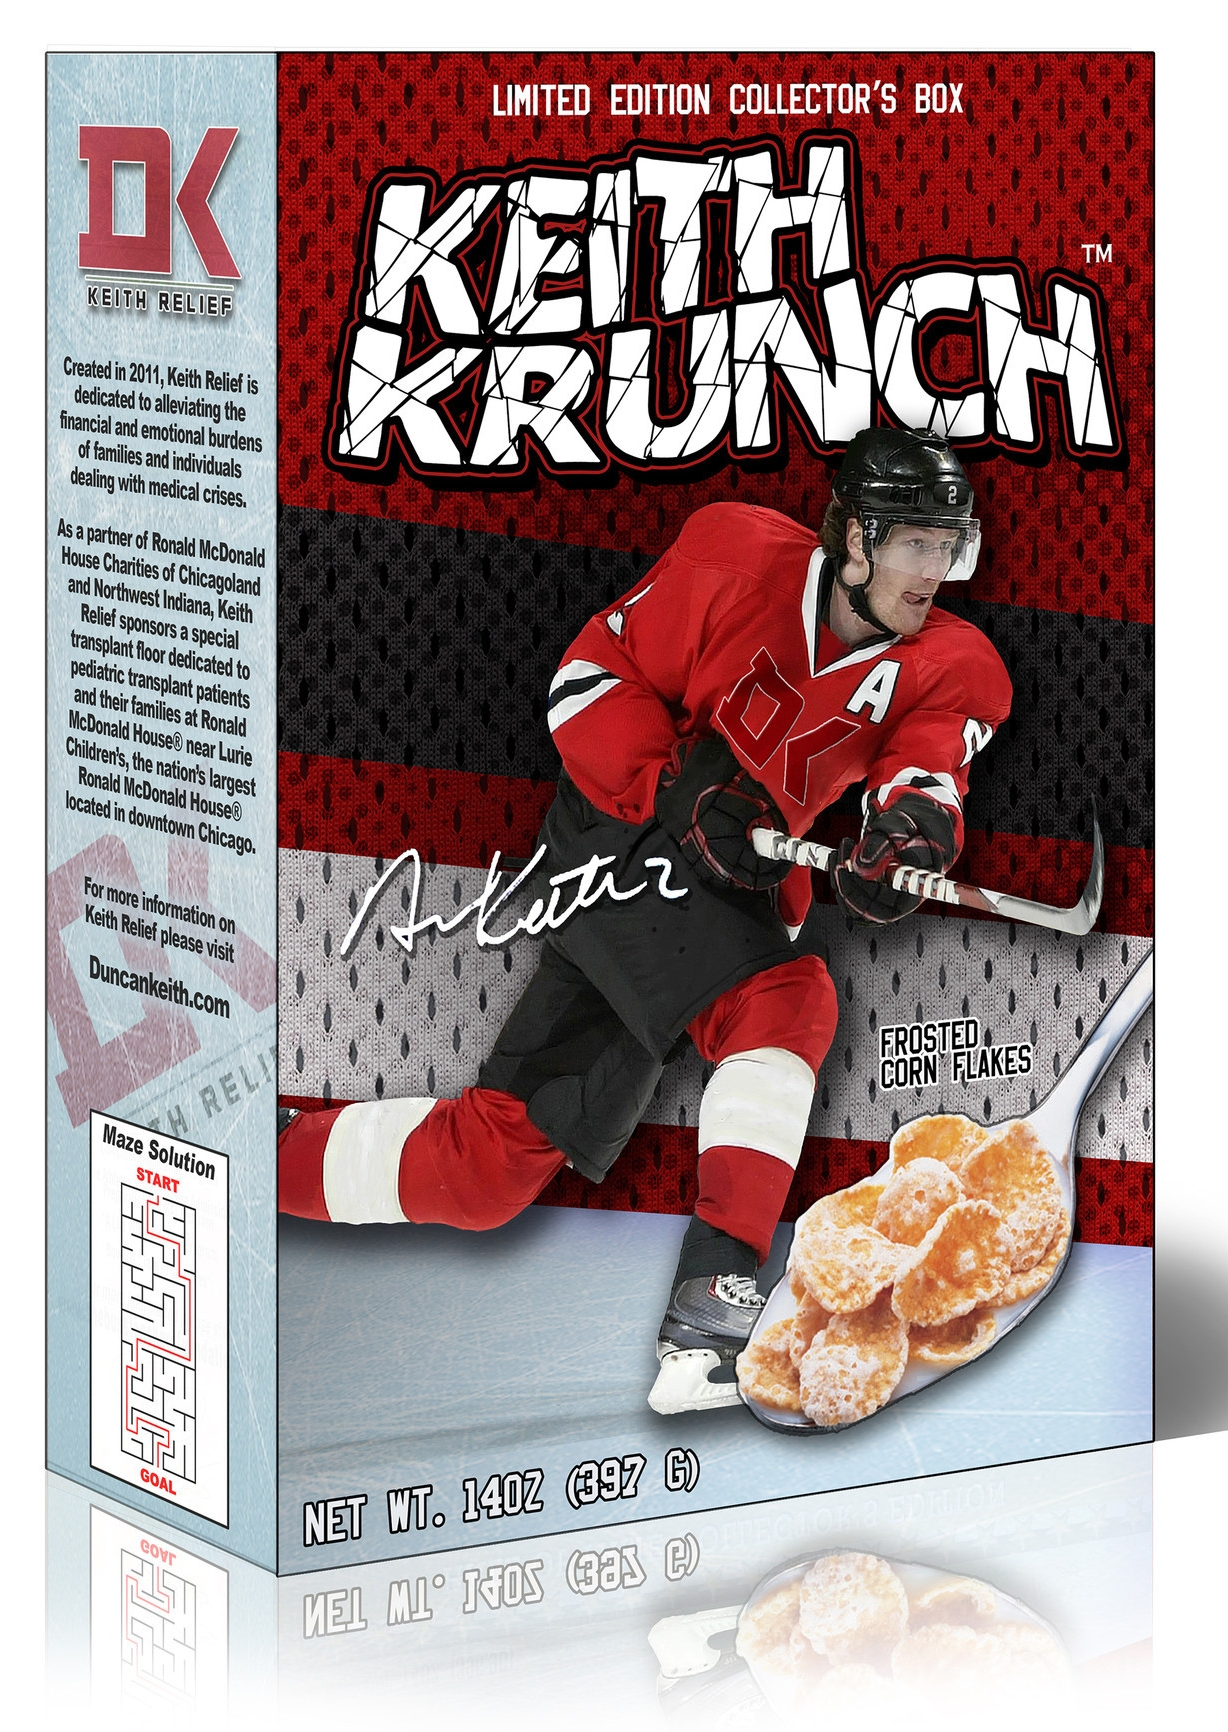 Keith Krunch